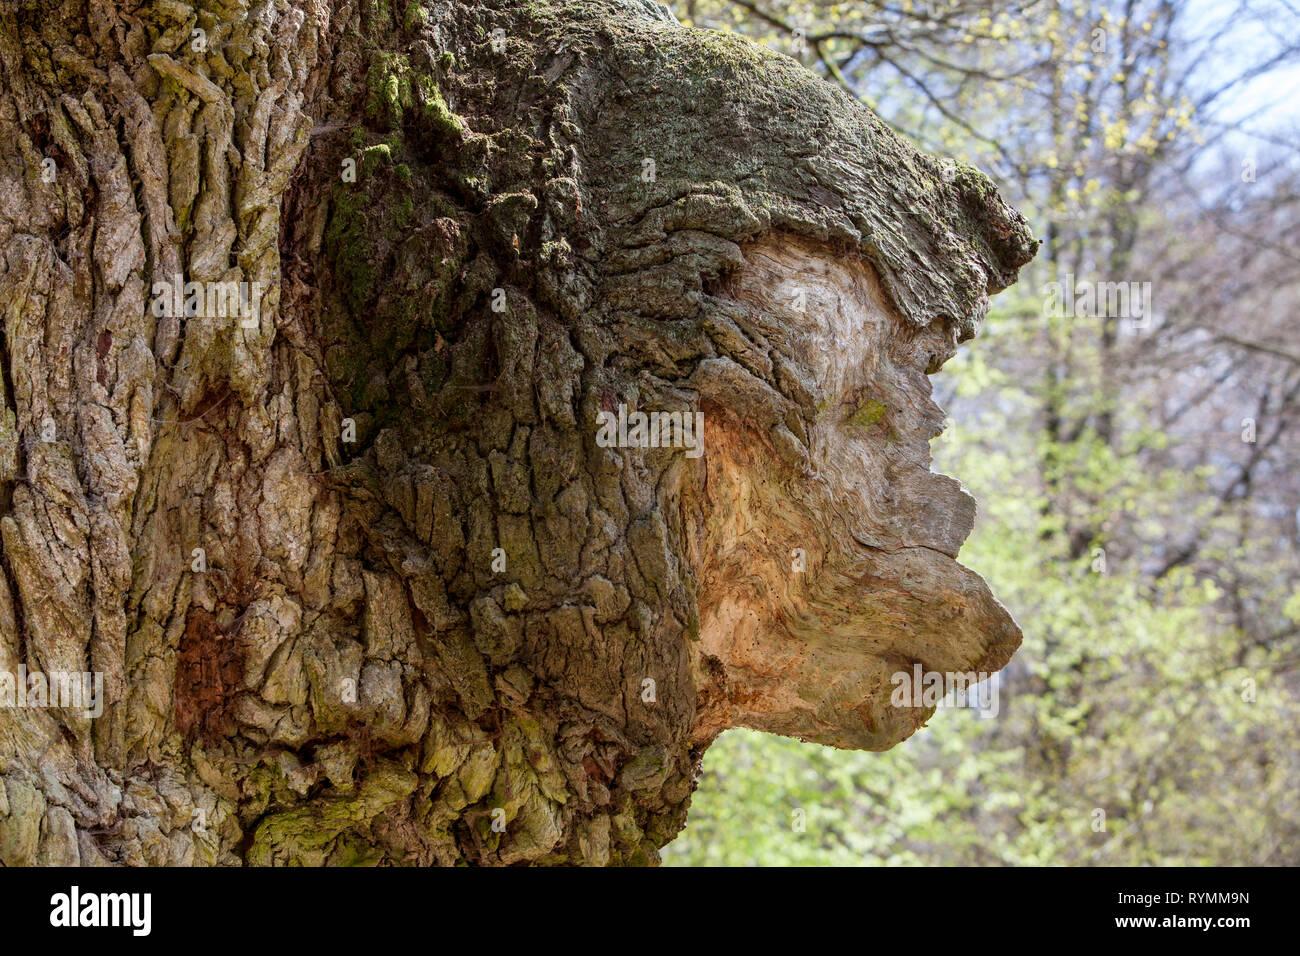 Tree face in a tree, Primeval forest Urwald Sababurg, Hofgeismar, Weser Uplands, Weserbergland, Hesse, Germany - Stock Image